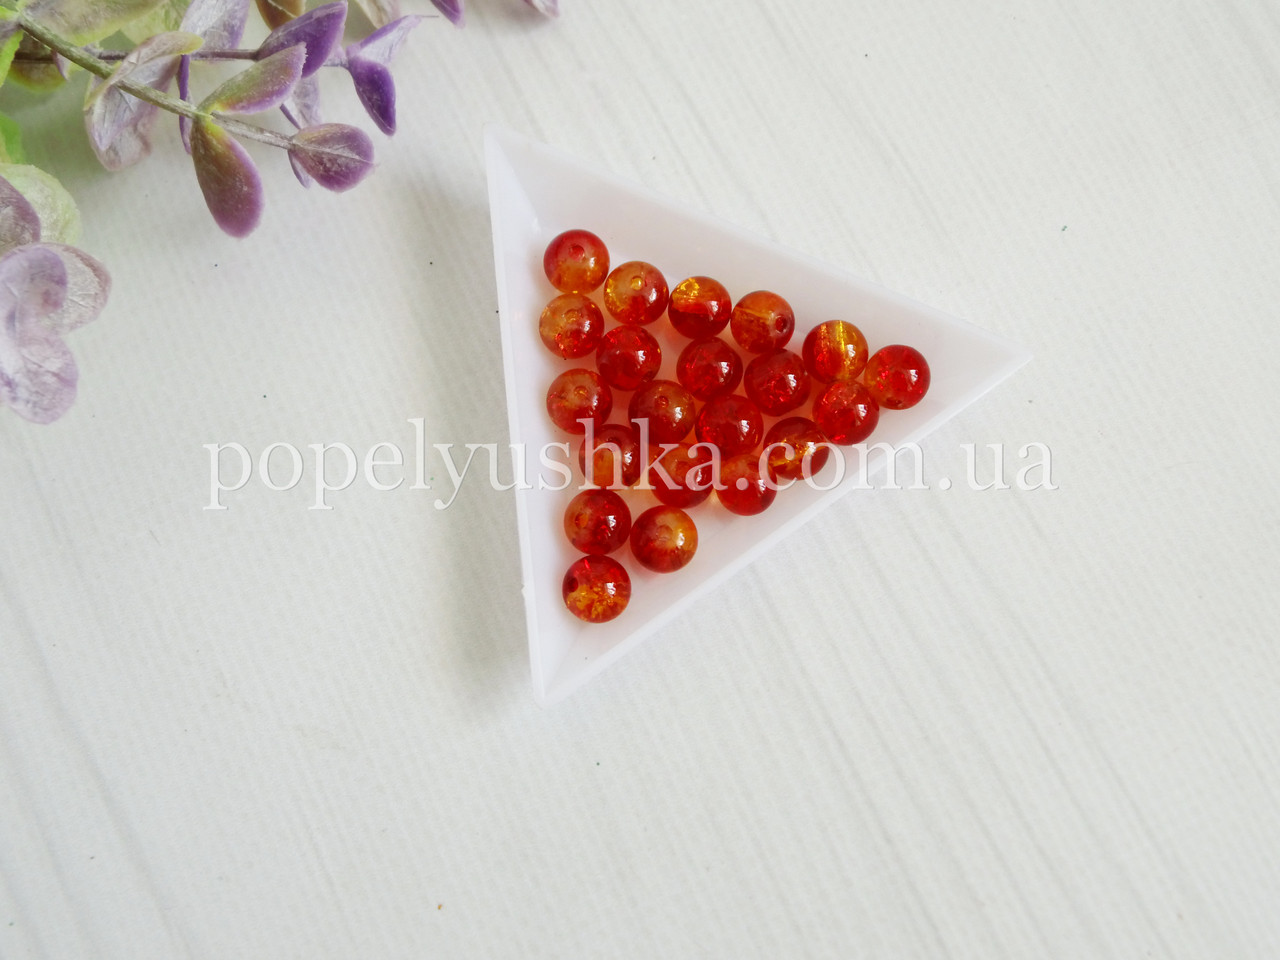 Бусины 8 мм красно-желтые (20 шт.)